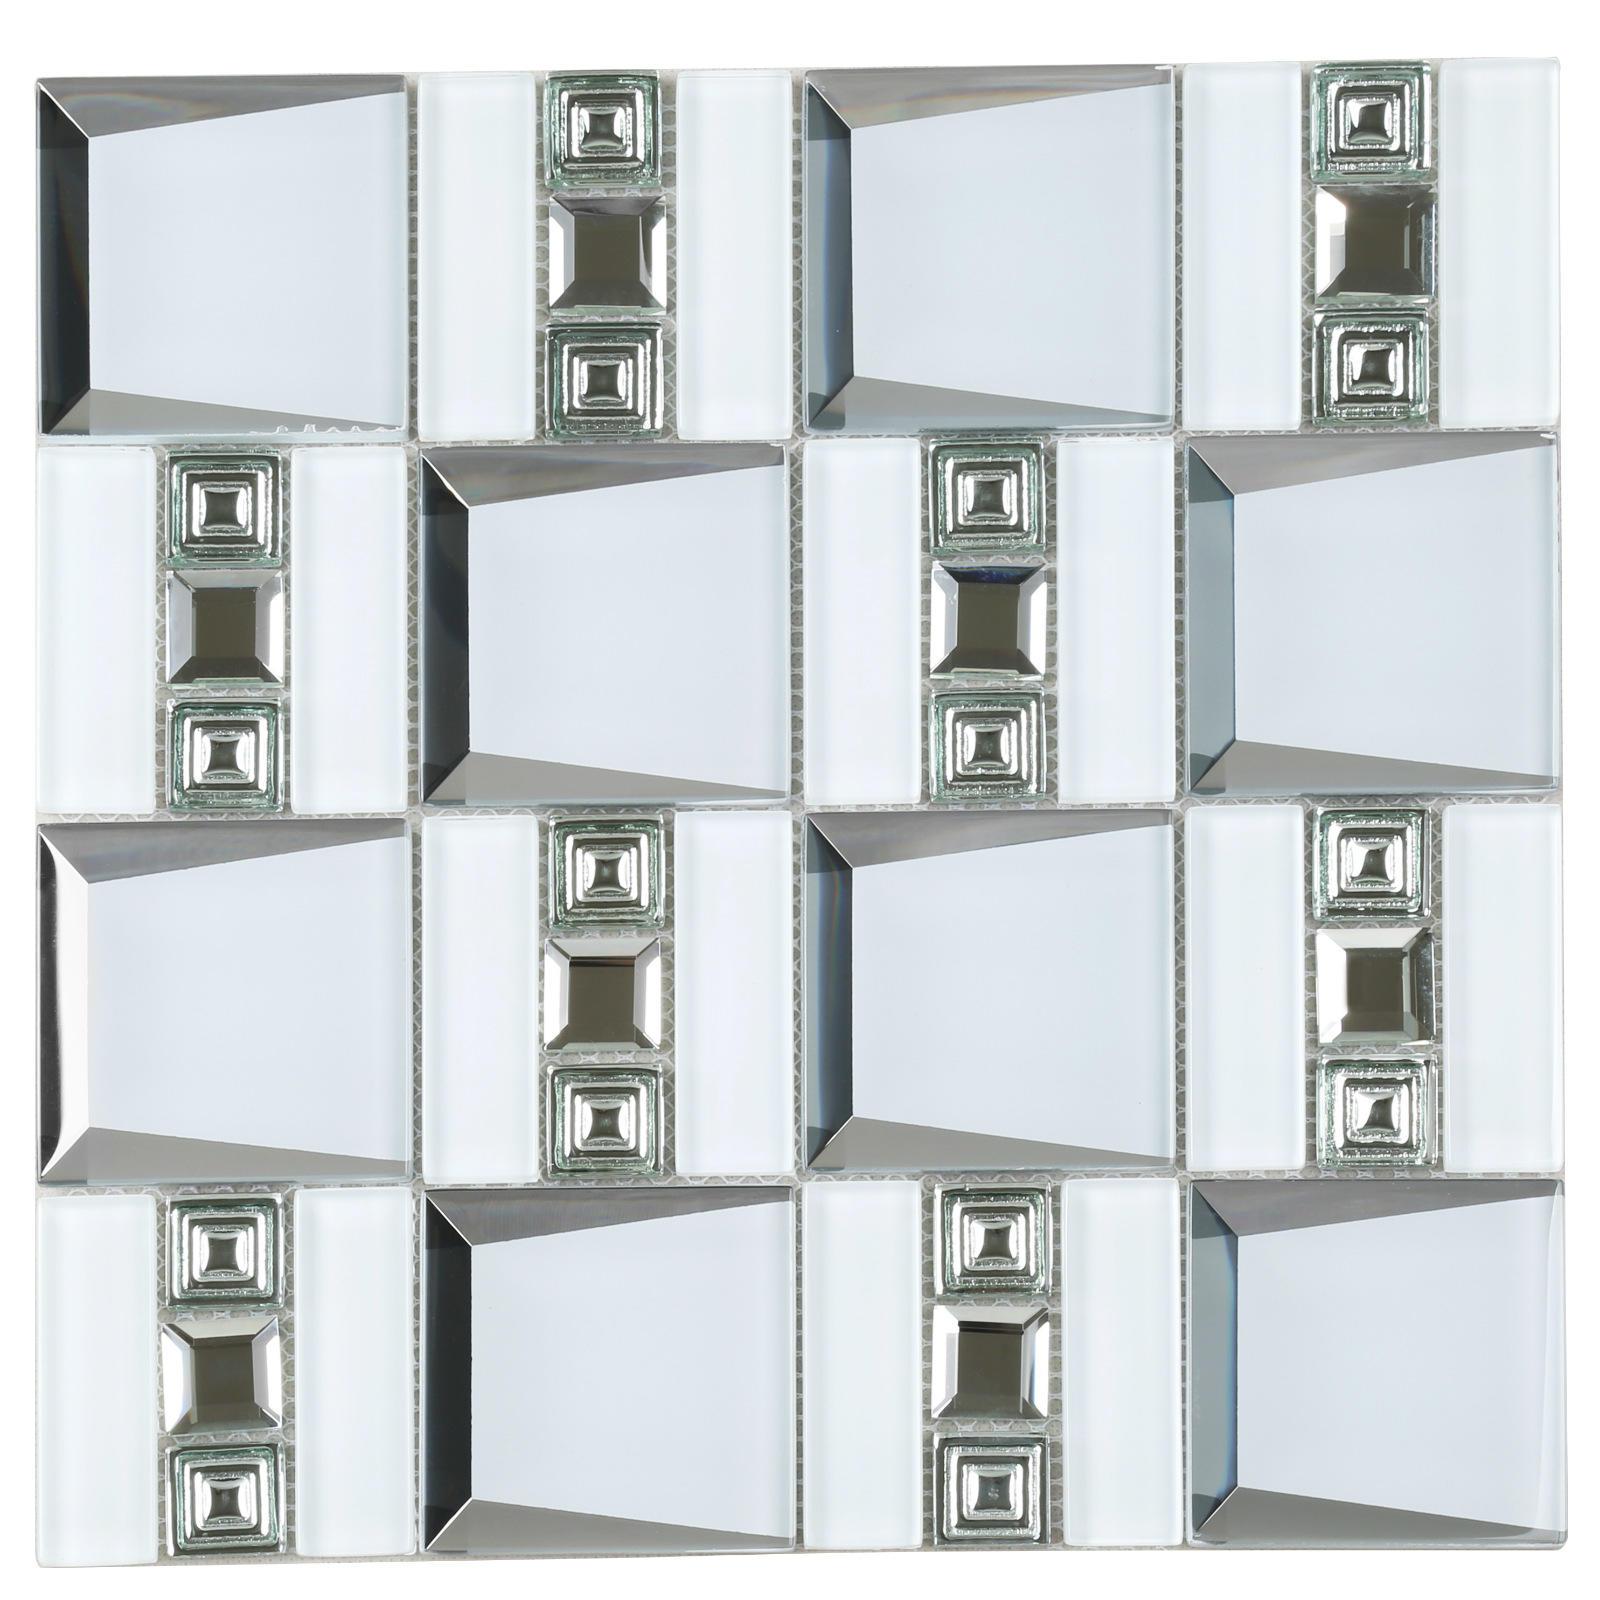 HMB120 3D Beveled Crystal Glass Mosaic Tile Italian White Wall Cover